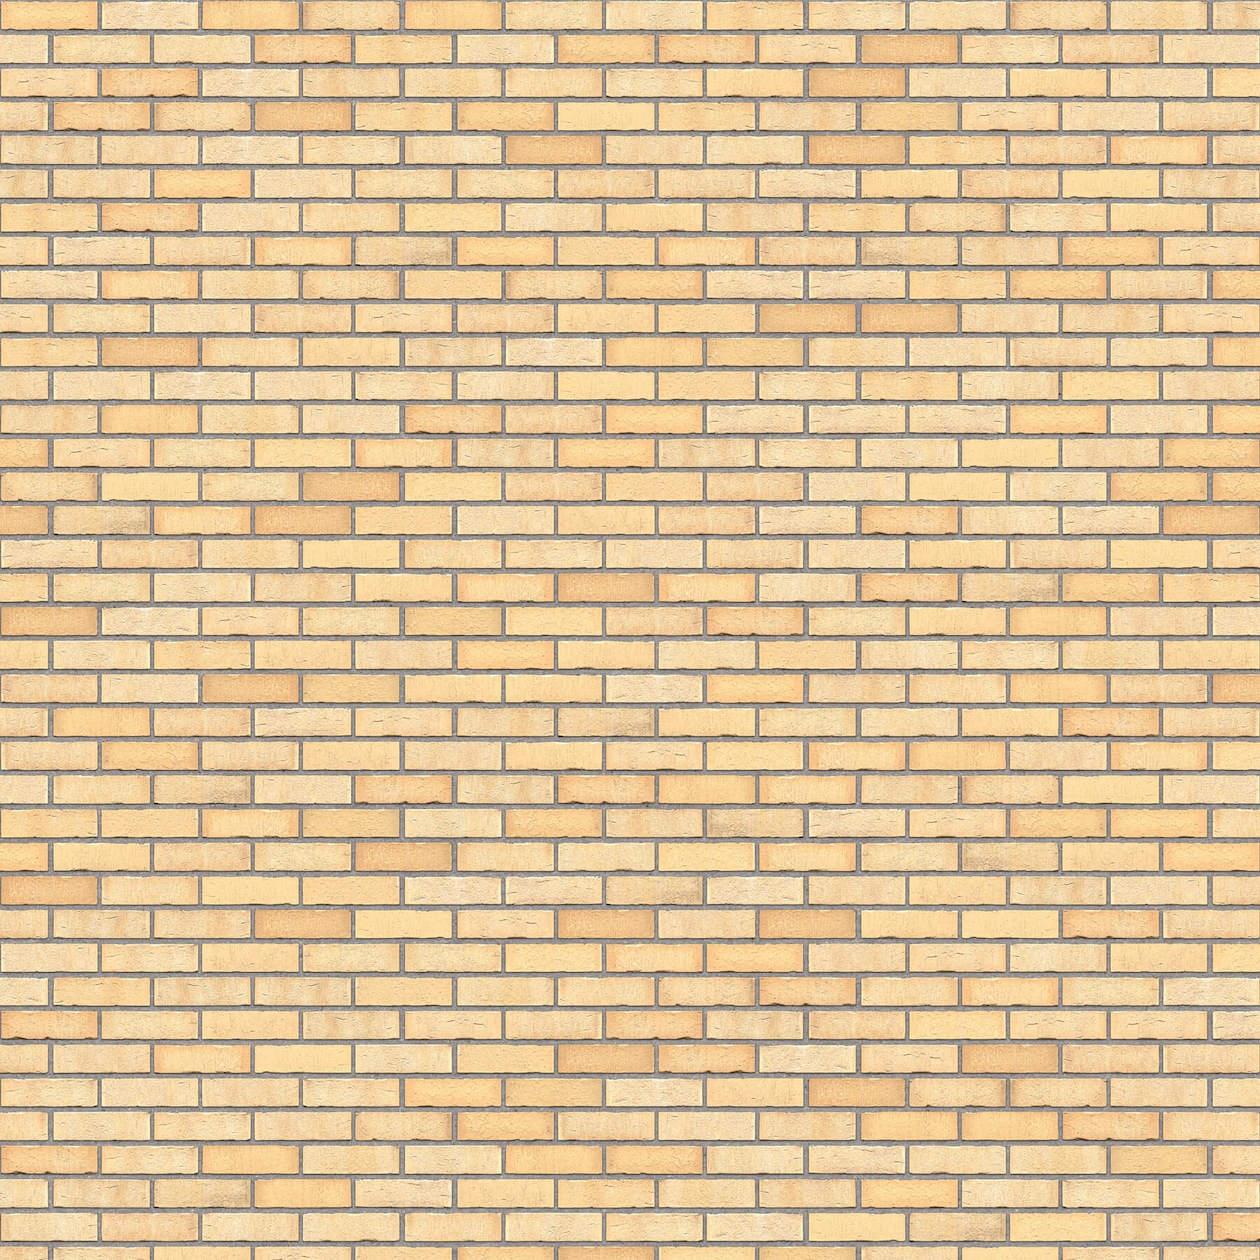 Puna-cigla-FeldHaus-Klinker-brick-house-Beograd-nf-k-724-Siva Fuga